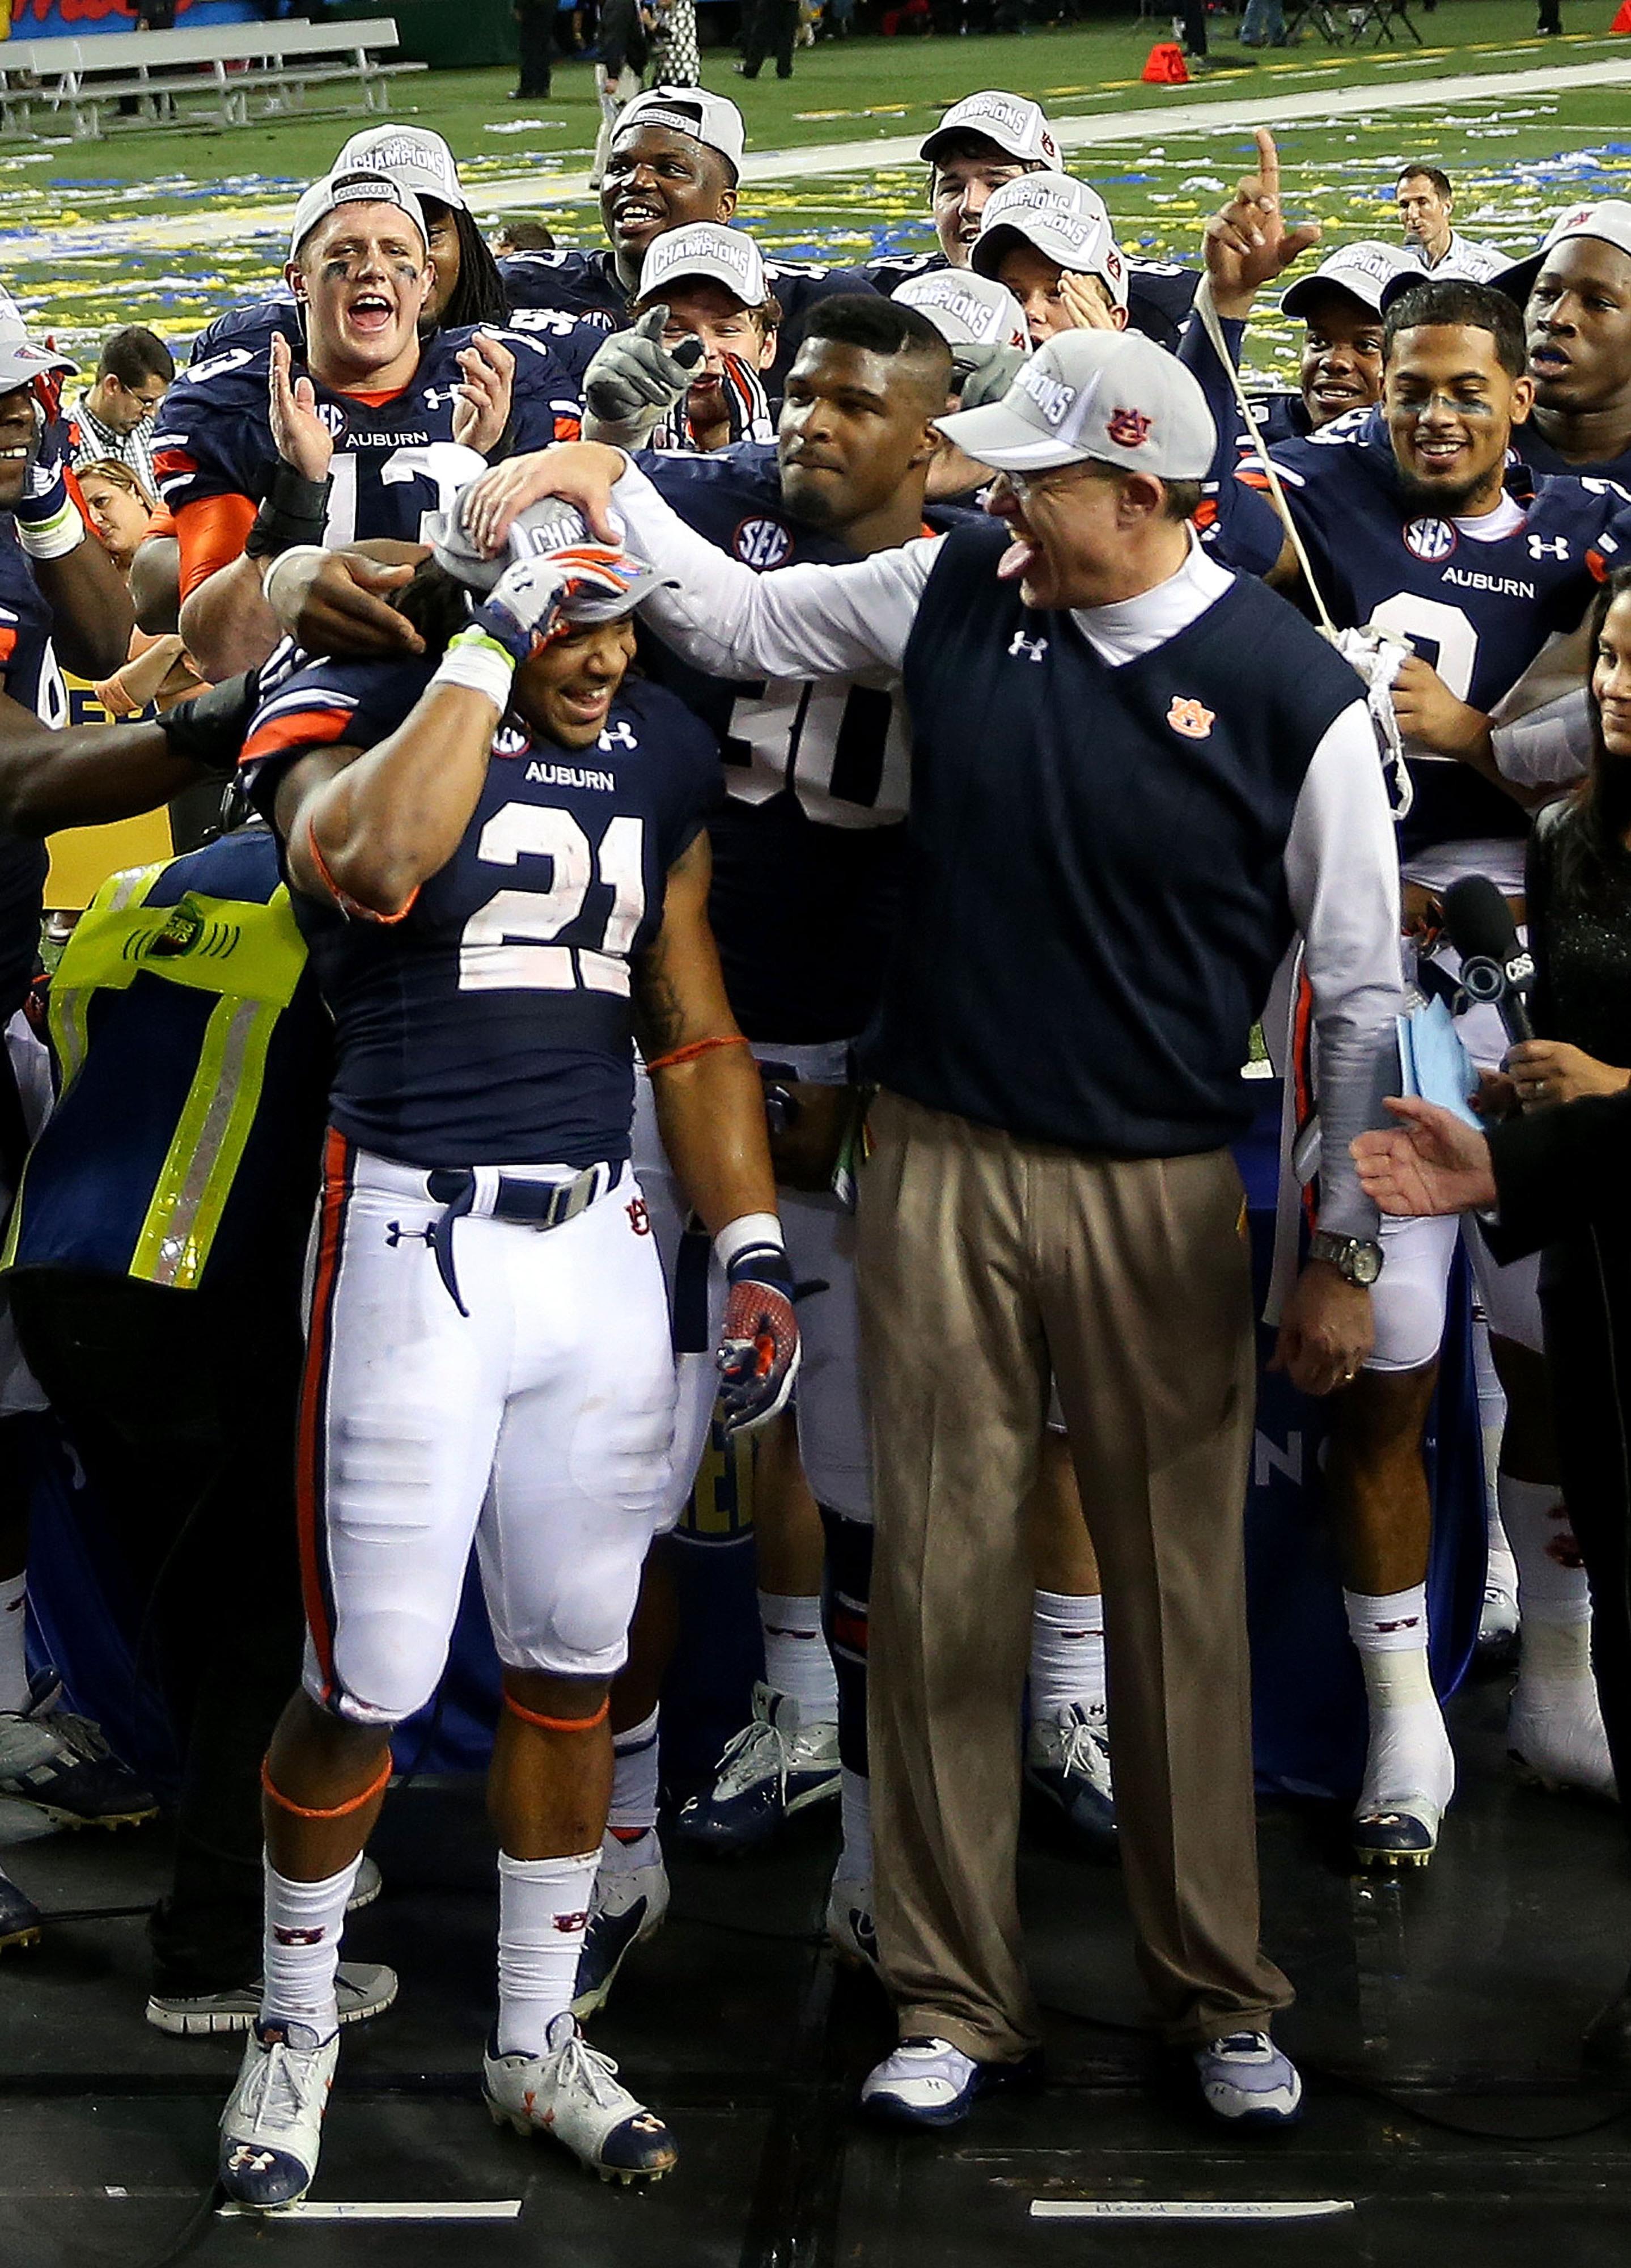 College football rankings: Florida State, Auburn top final 2013 BCS standings